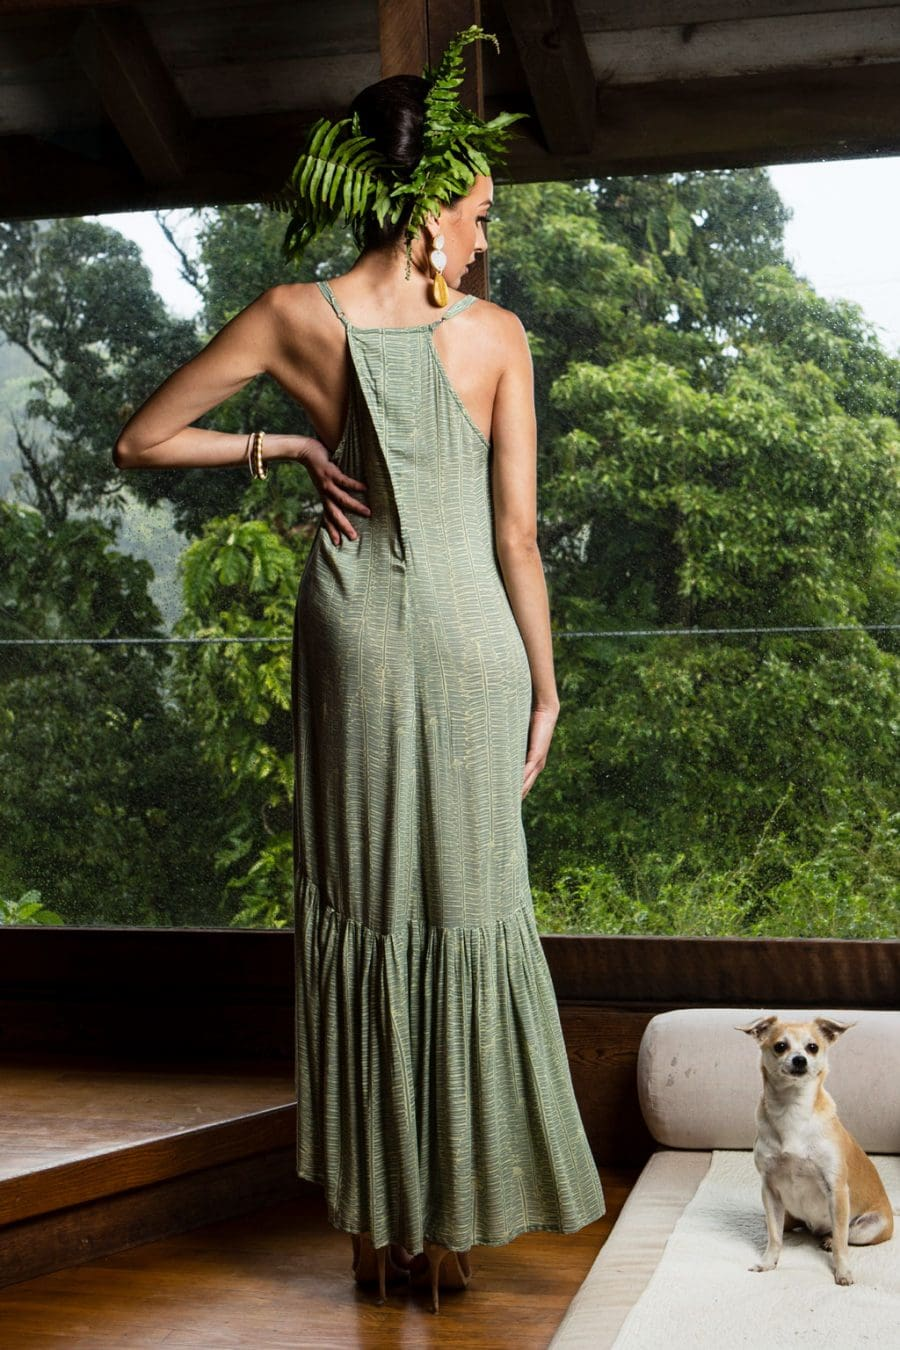 Model wearing Oluolu Maxi Dress in Lily Pad Margarita Kupukupu pattern back view